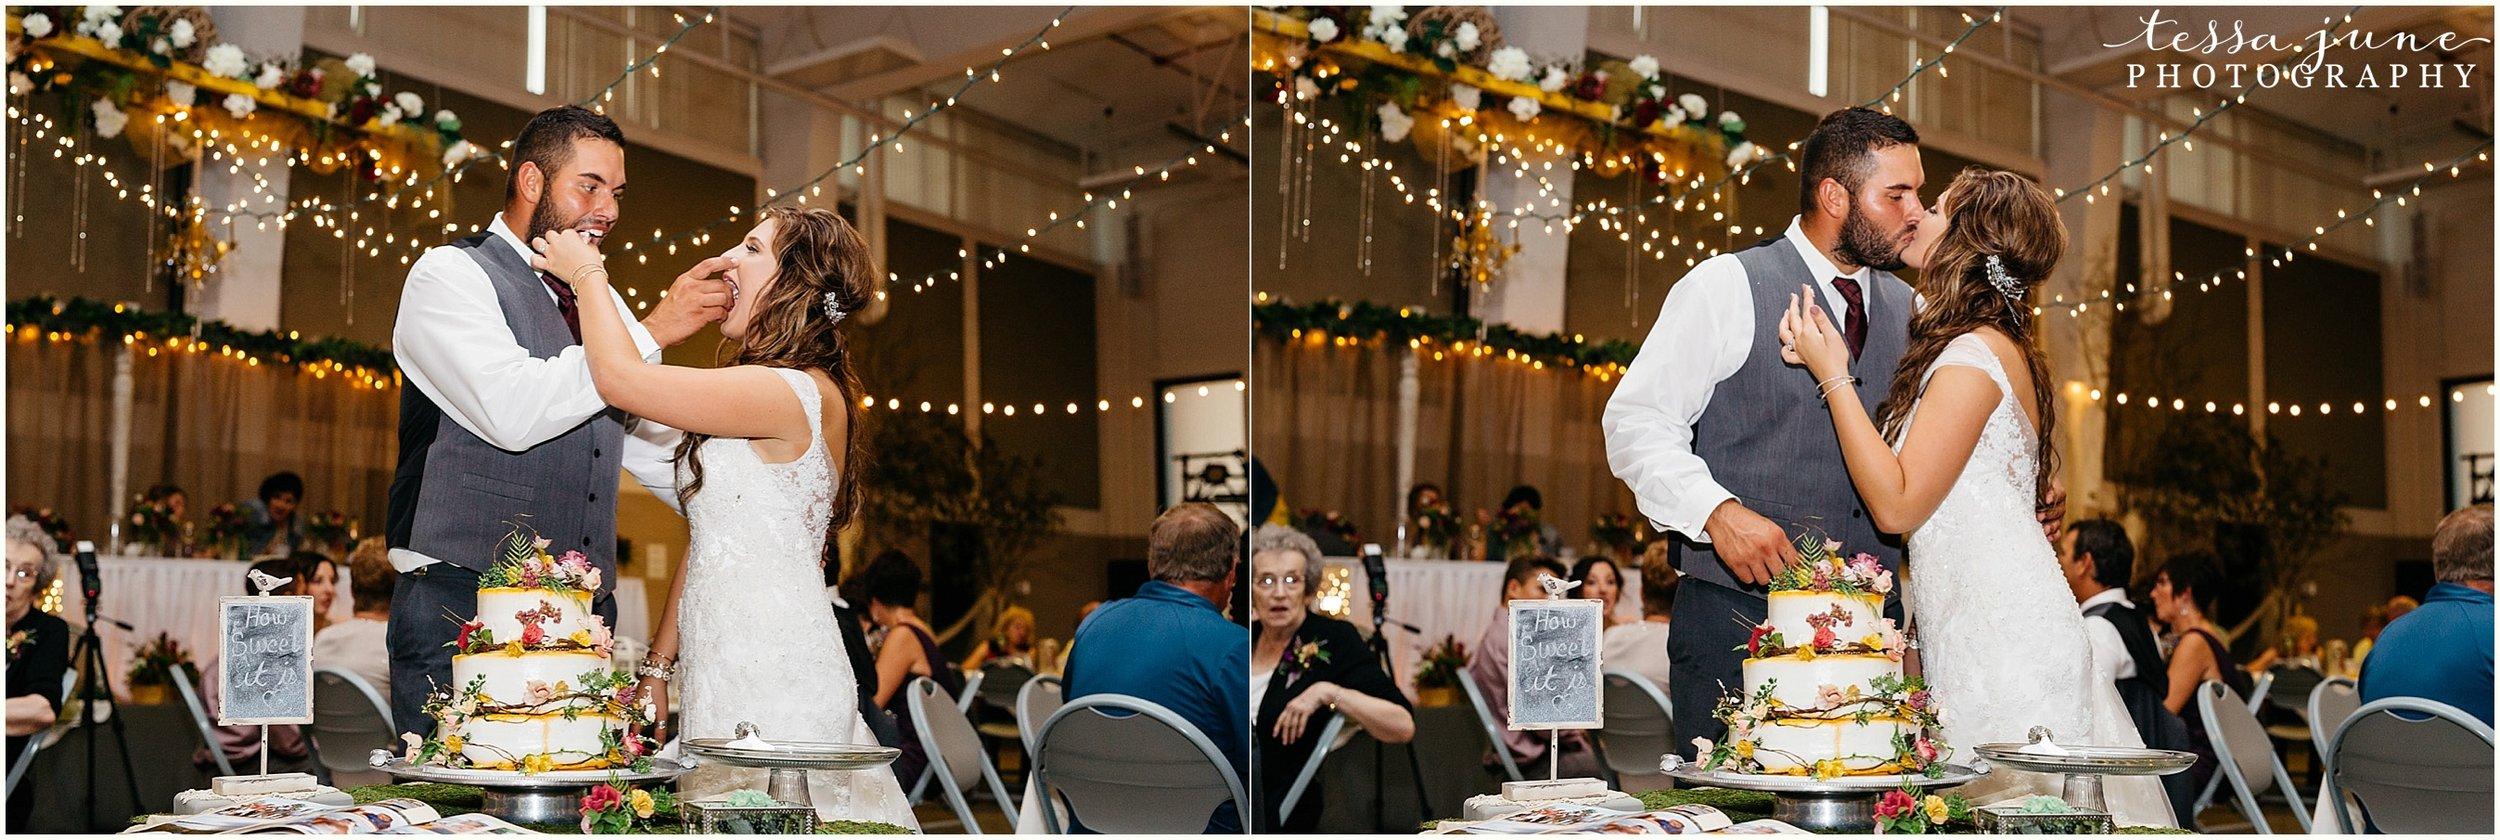 bohemian-minnesota-wedding-mismatched-bridesmaid-dresses-waterfall-st-cloud-tessa-june-photography-169.jpg